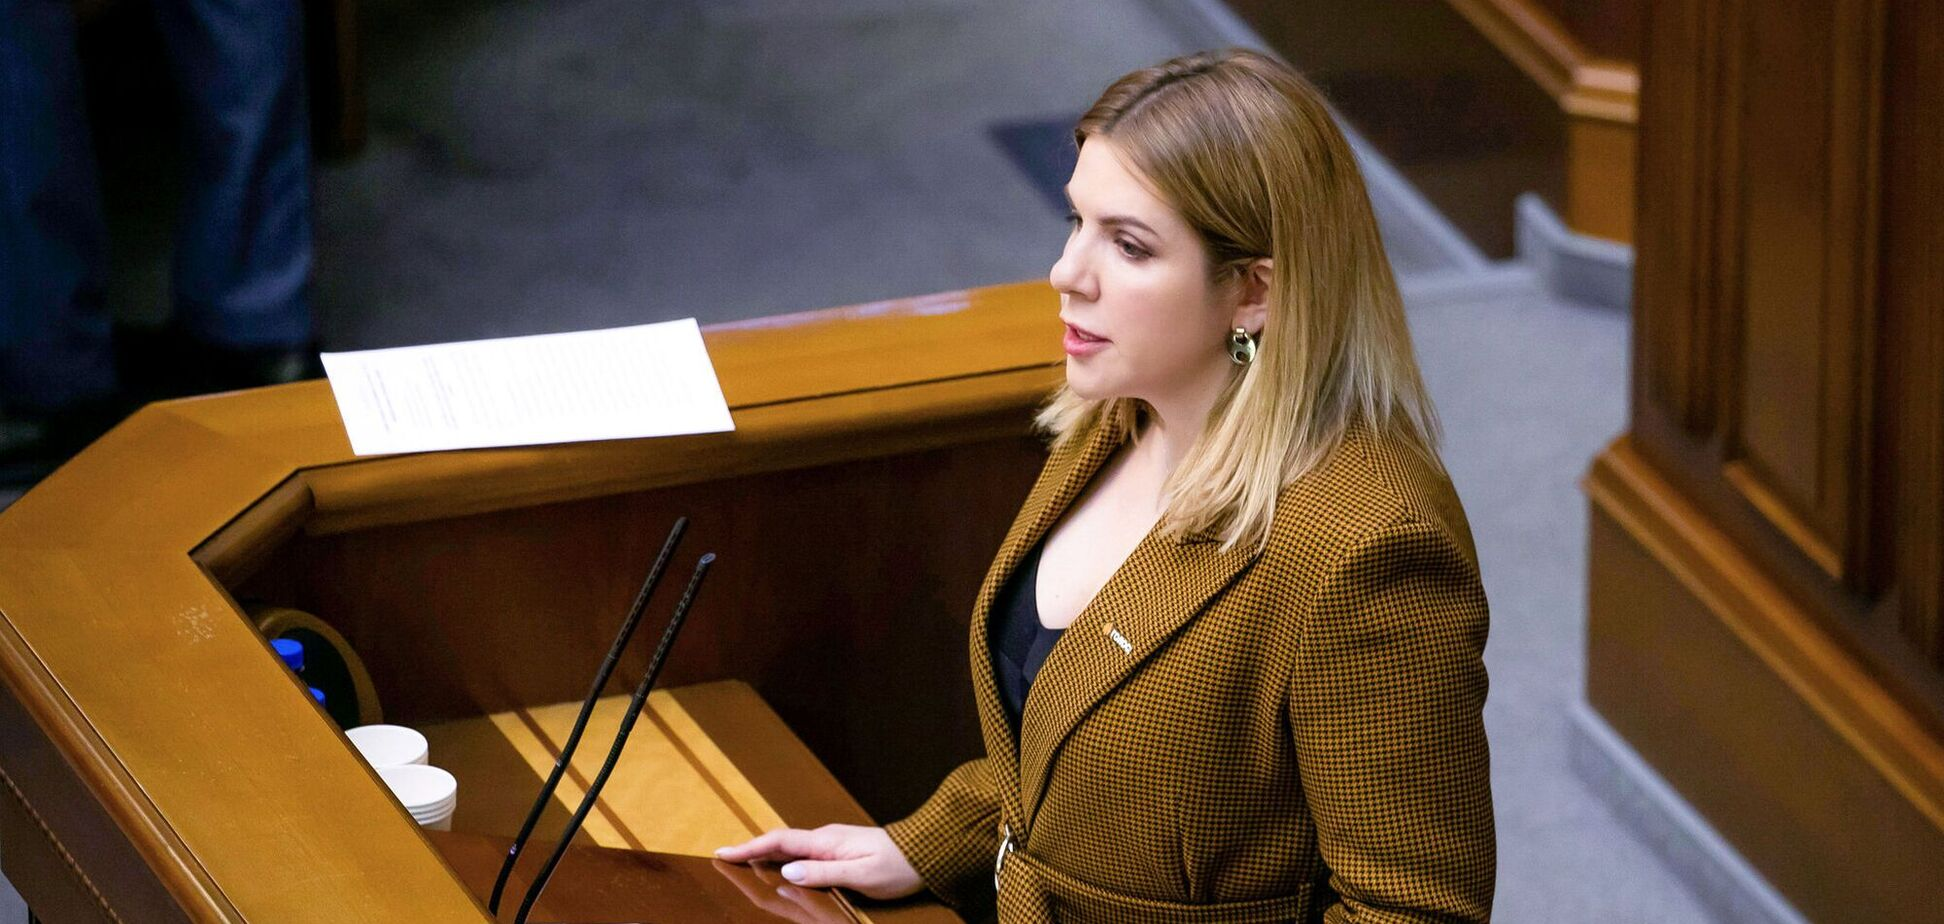 Прихоти власти и самопиар, – Кира Рудык о проекте госбюджета-2022